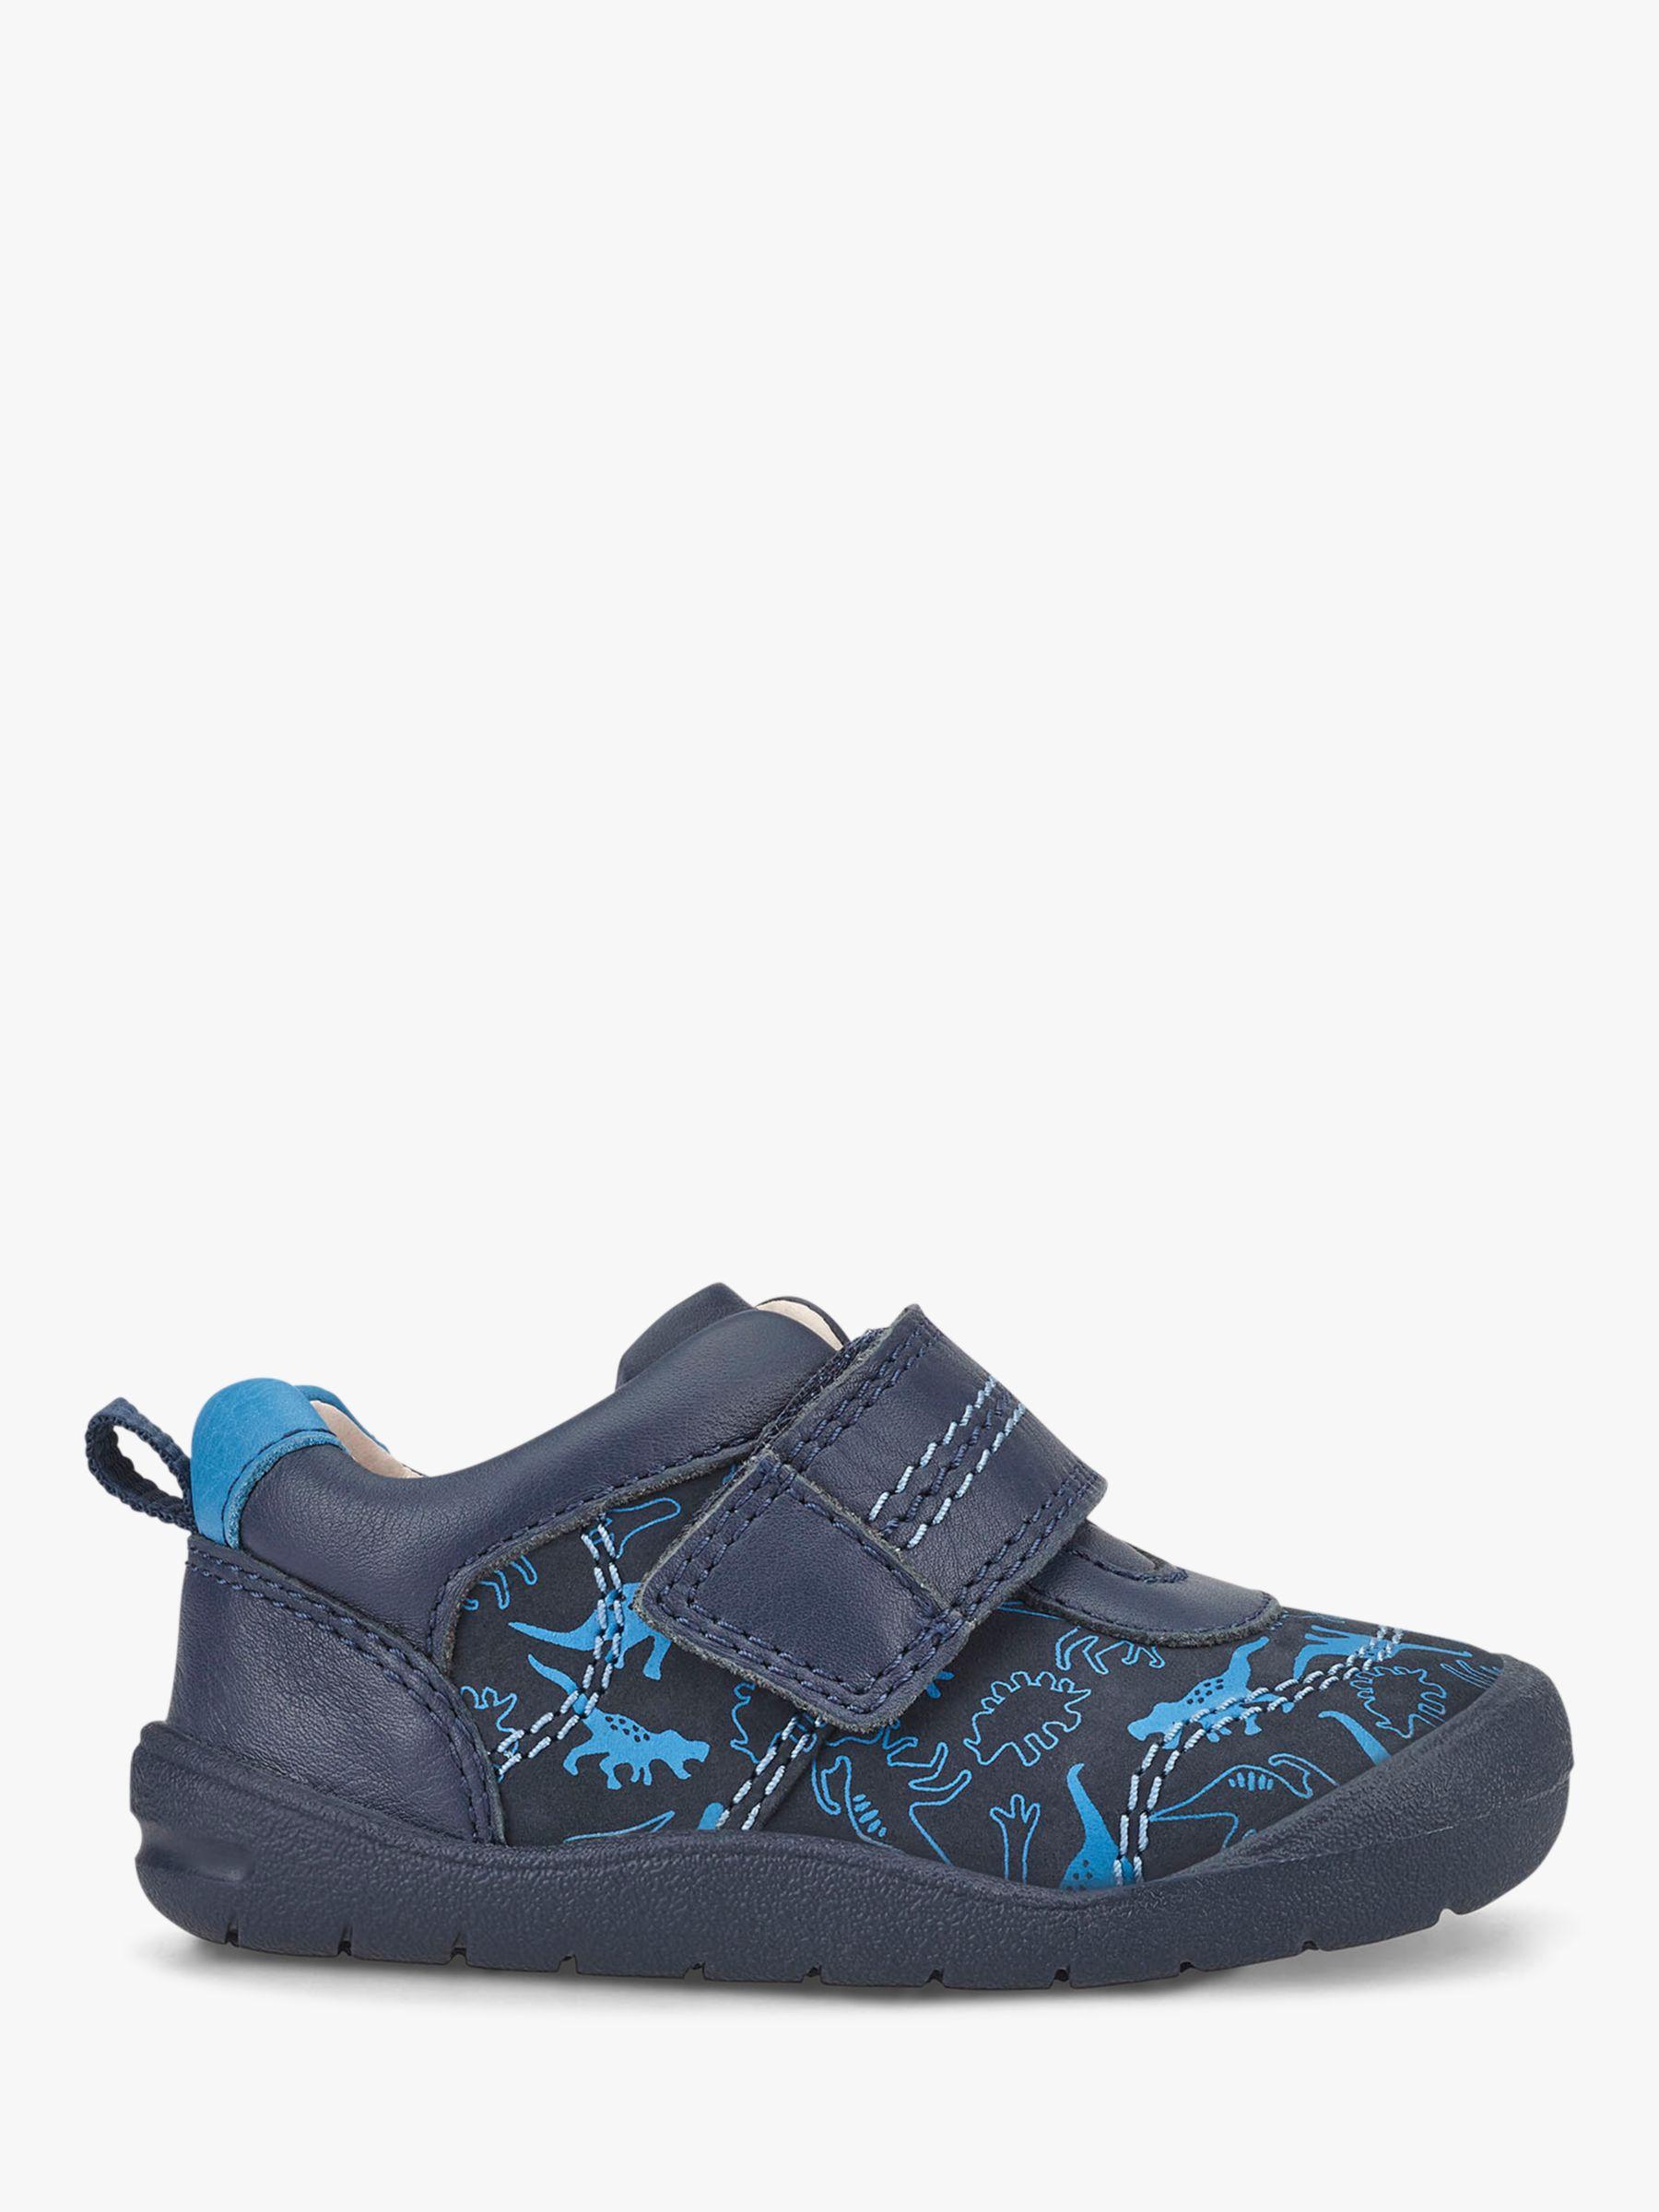 Start-Rite Start-rite Children's Footprint Dino Print Pre-Walker Shoes, Navy